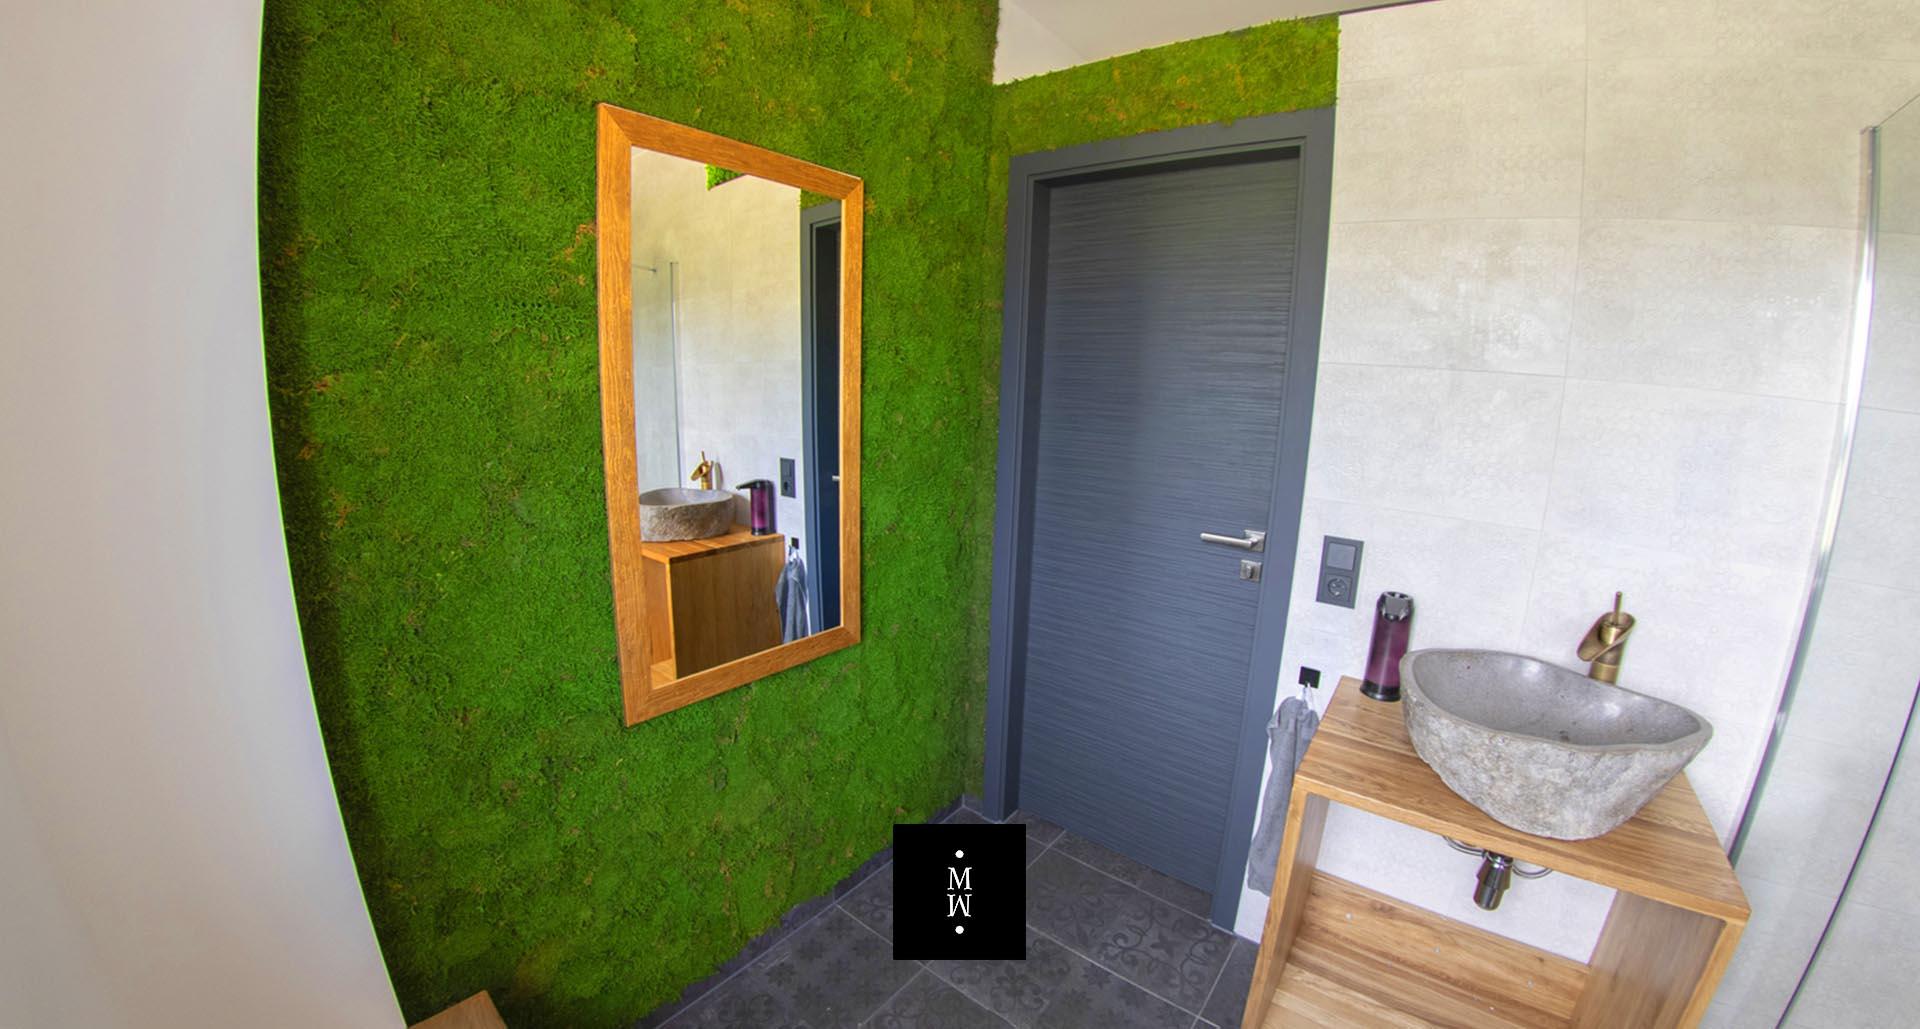 Mooswand aus Waldmoos im Badezimmer